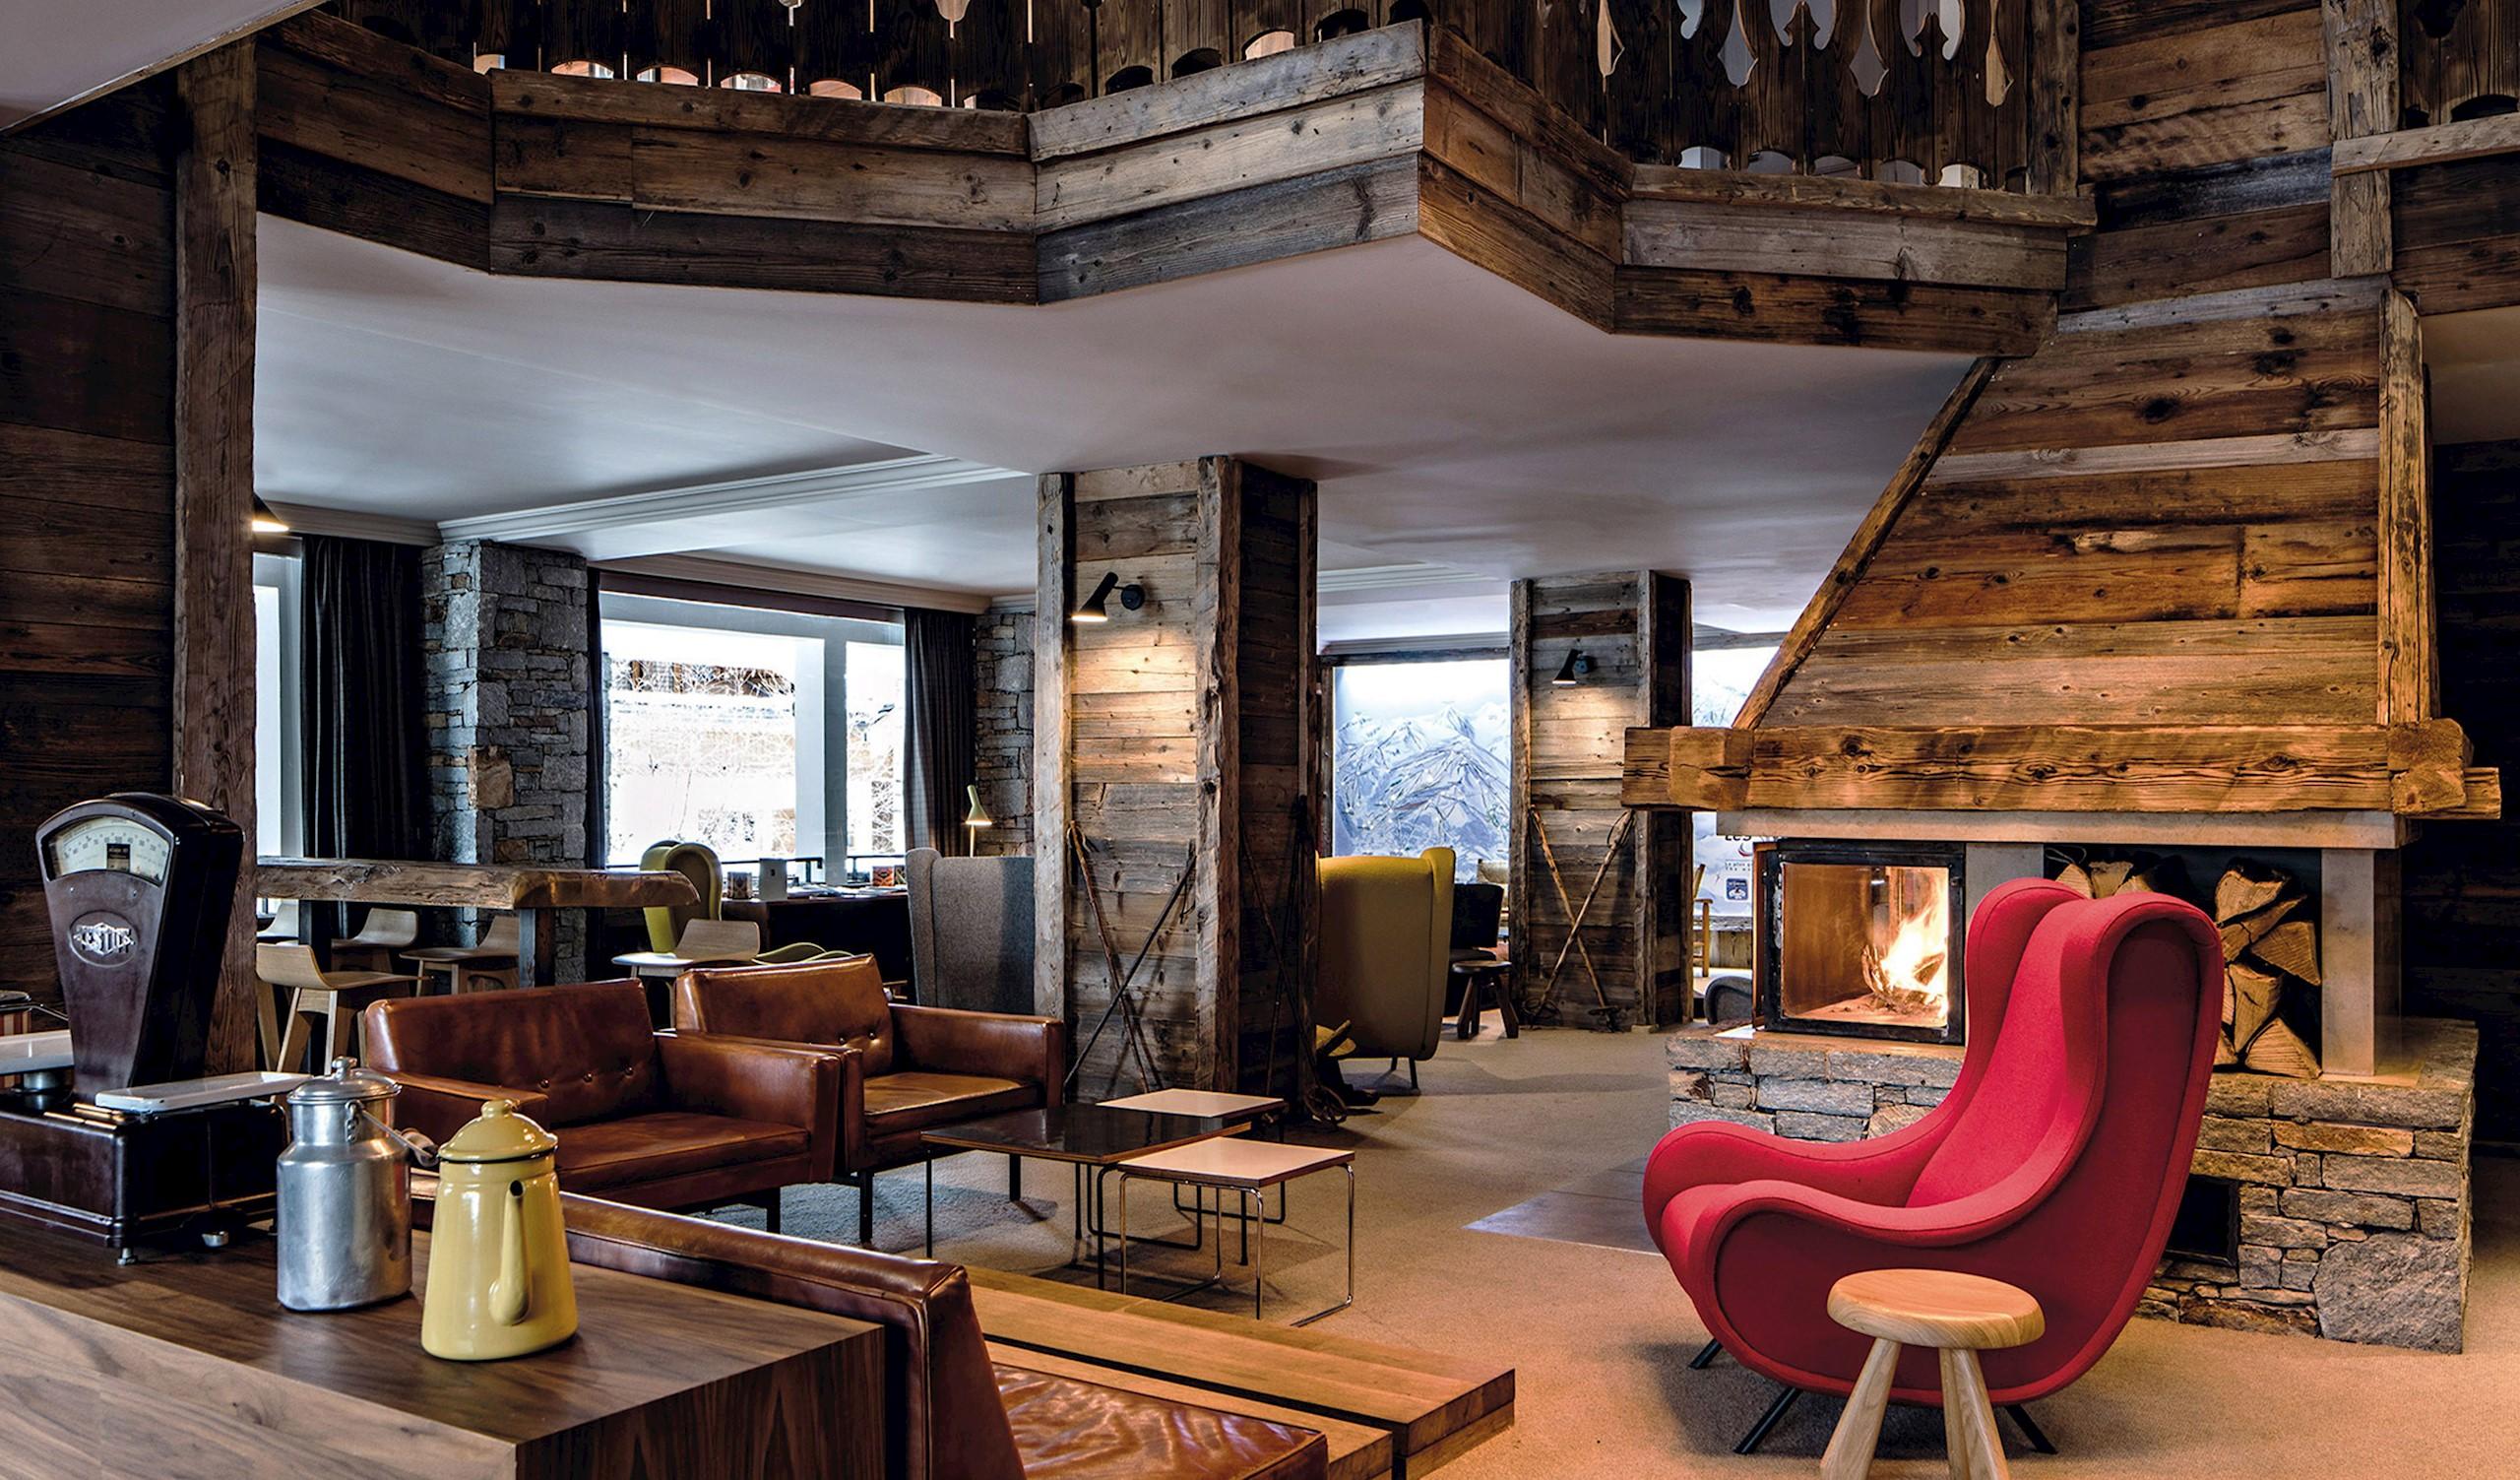 courchevel france design hotels